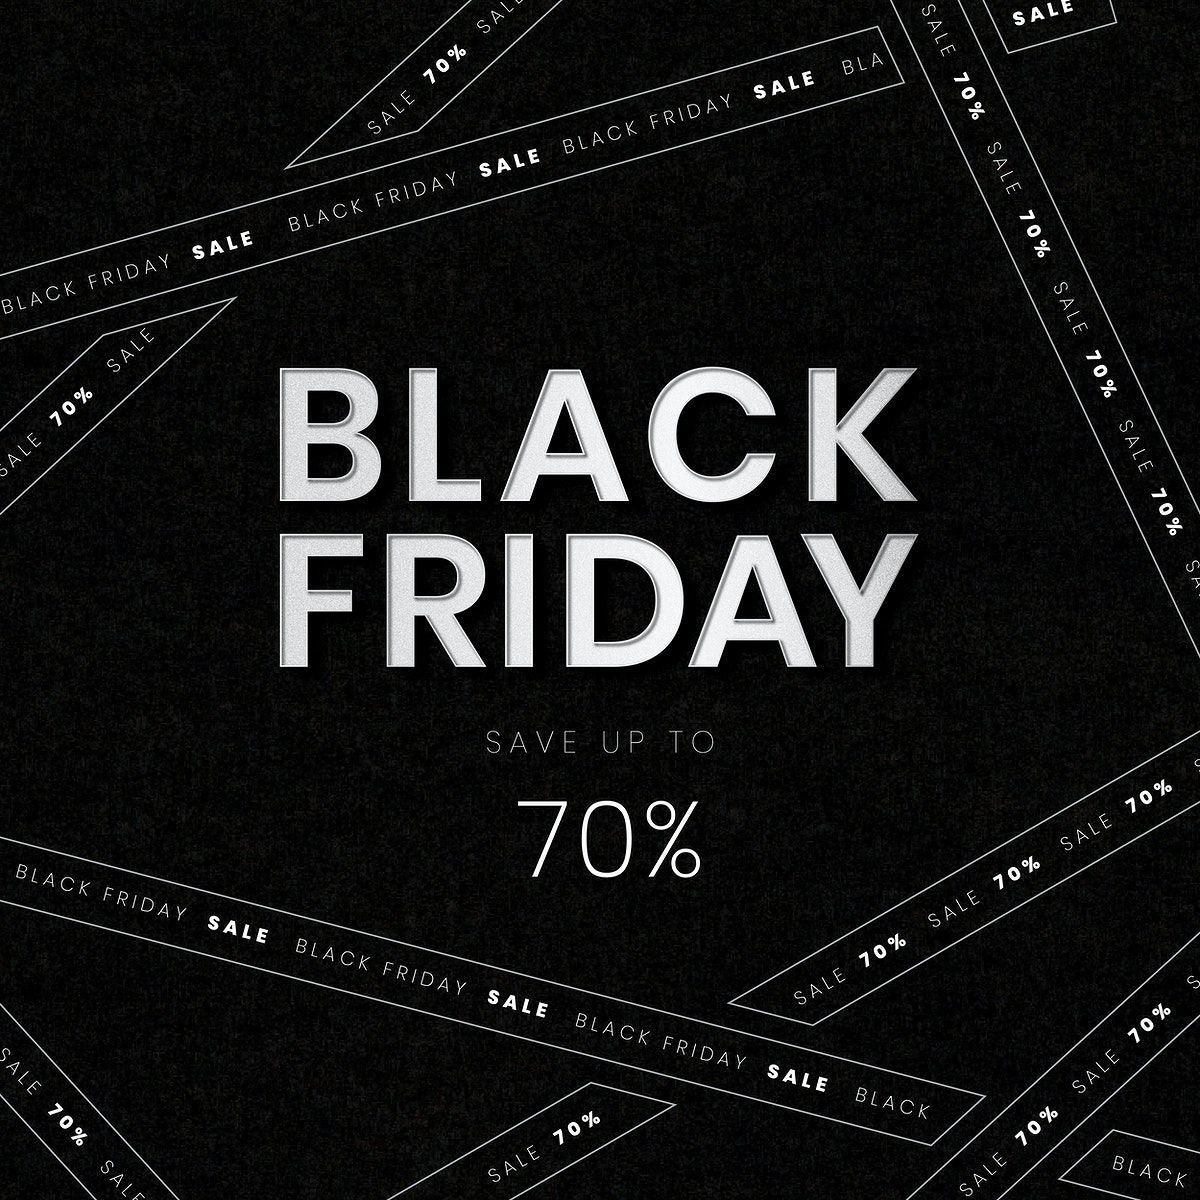 Download Premium Vector Of 70 Off Black Friday Vector Cross Tape Sale Ad Black Friday Ads Black Friday Banner Black Friday Sale Flyer